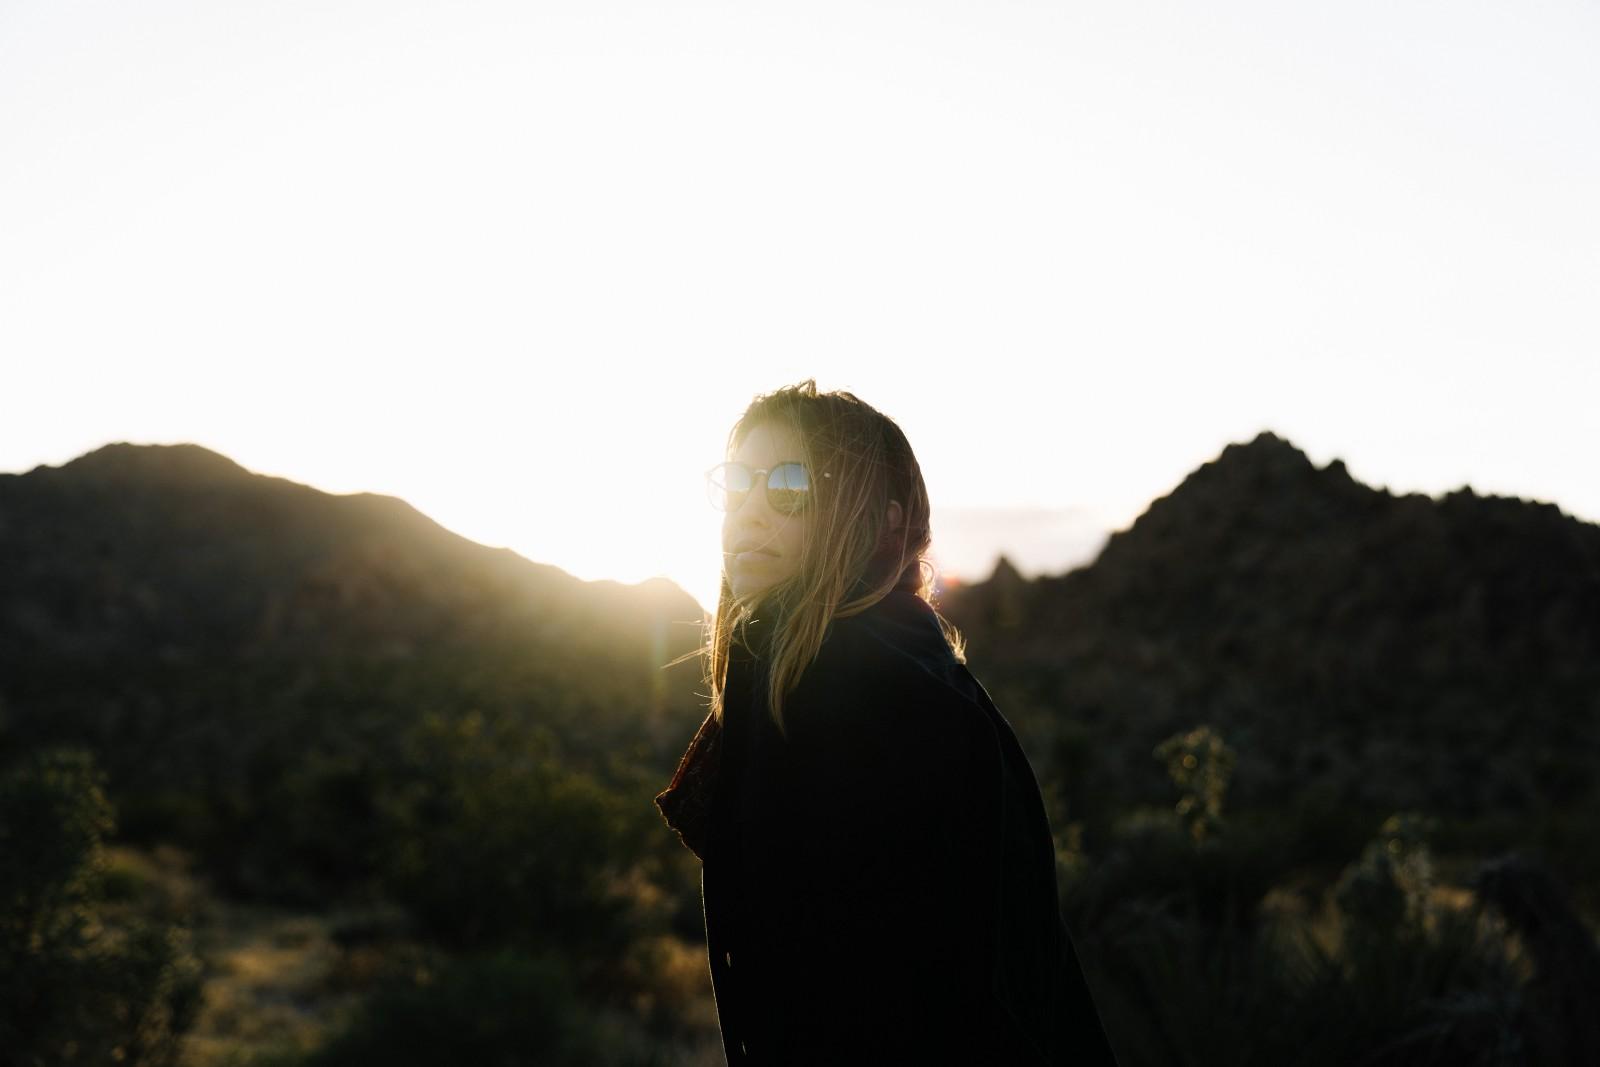 shooting-desert-photography